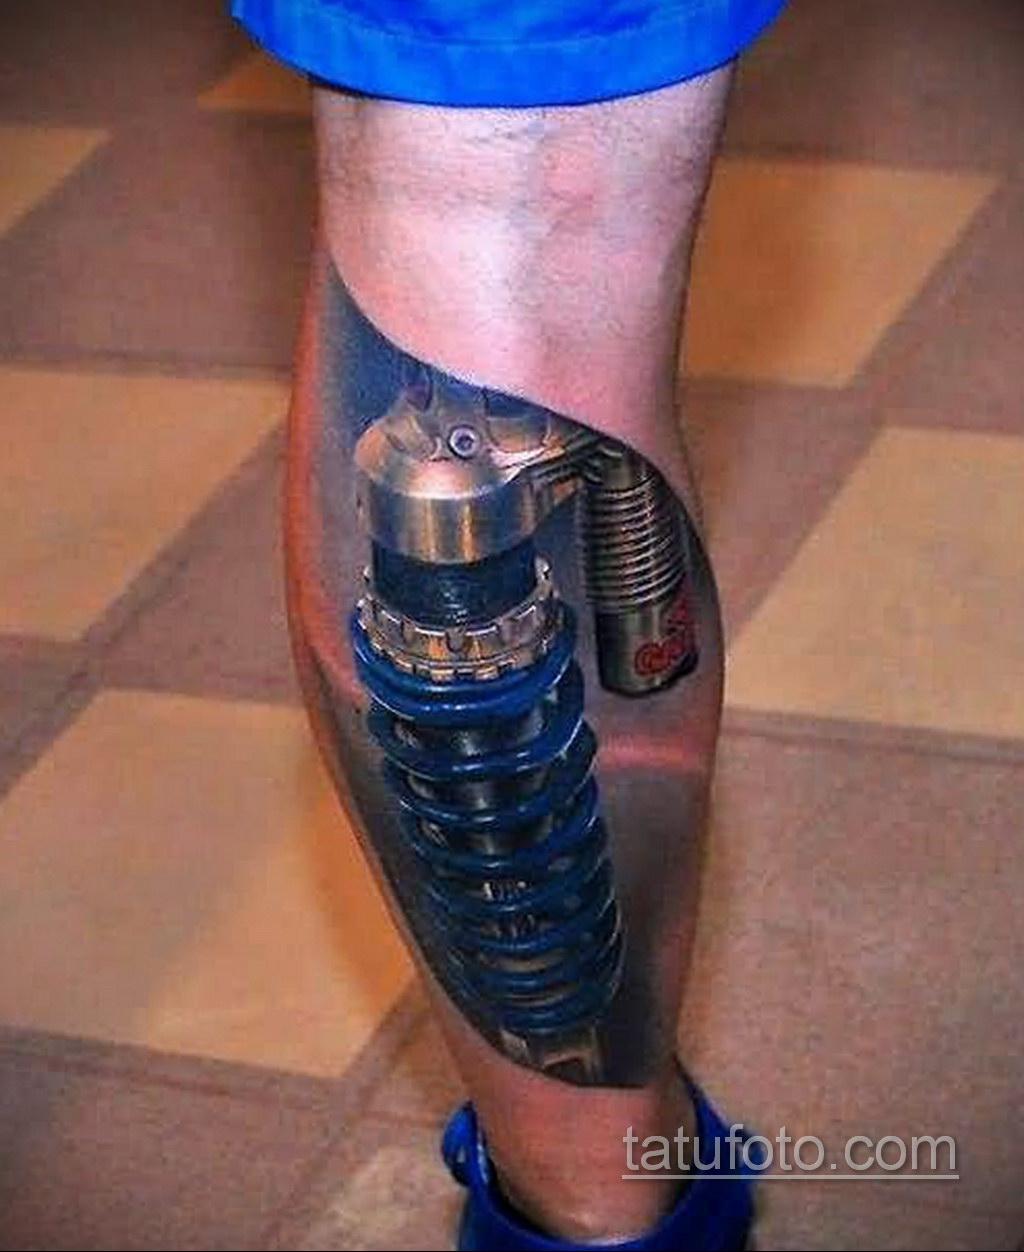 тату биомеханика 3д 31.10.2019 №013 - 3D biomechanics tattoo - tatufoto.com